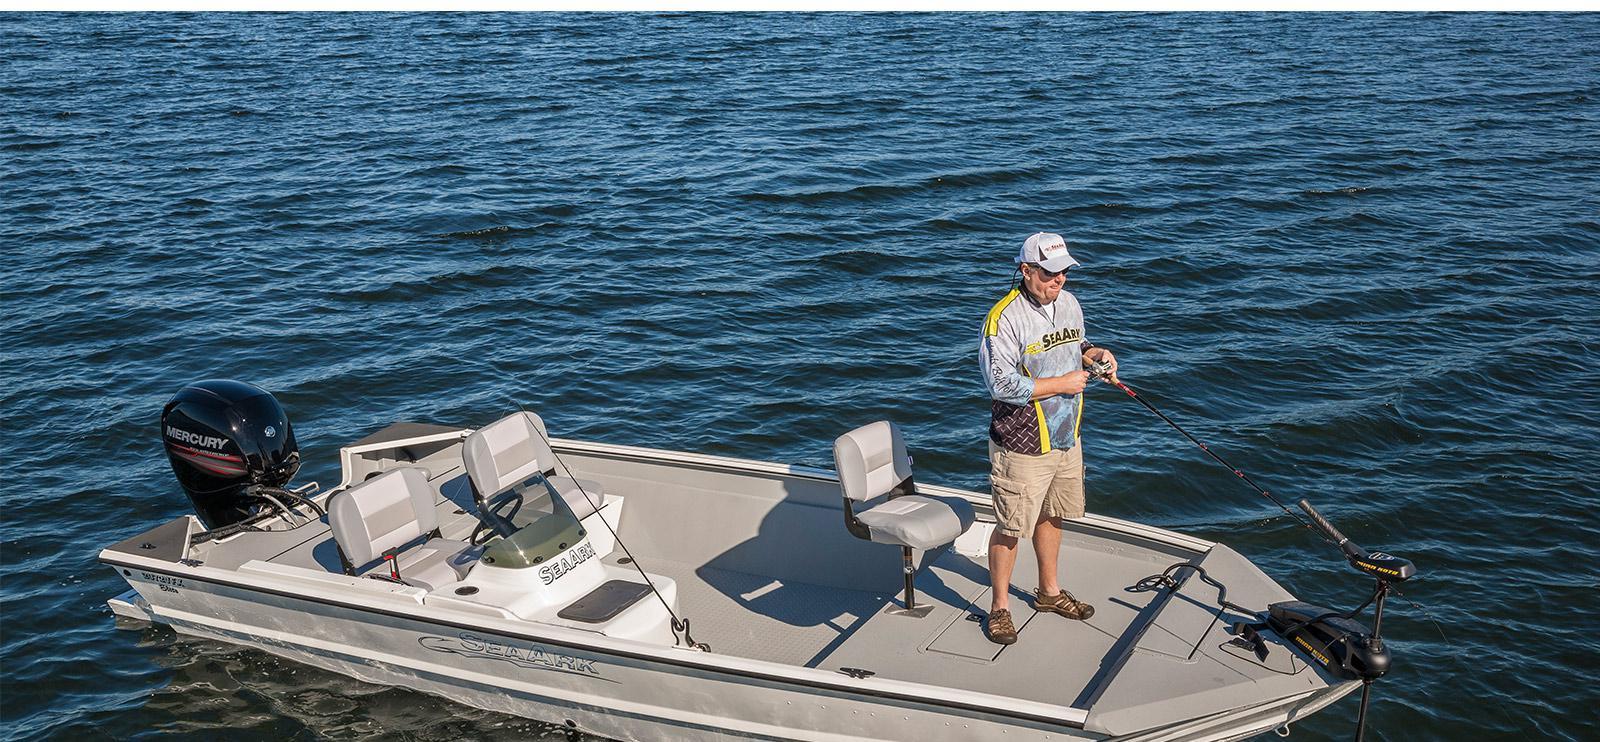 graham marine s provides premium boats equipment and inventory parts